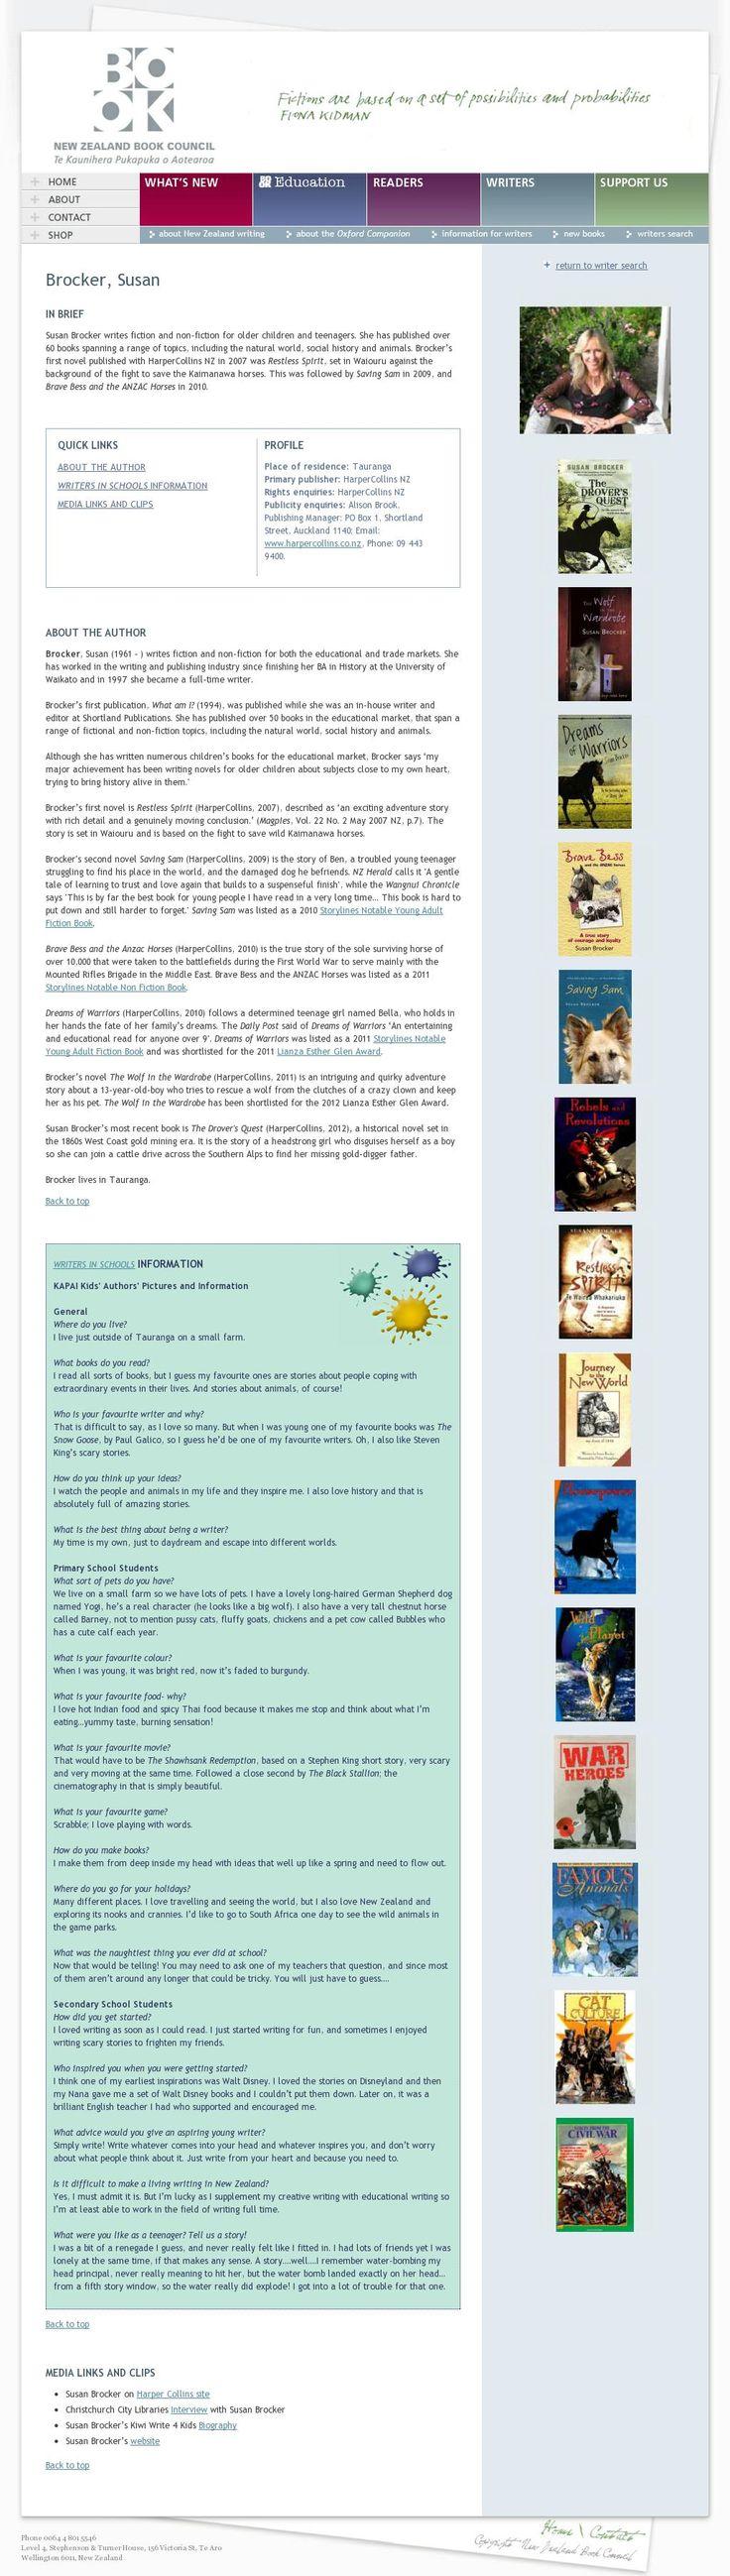 The website 'http://www.bookcouncil.org.nz/writers/profiles/brocker,%20susan' courtesy of @Pinstamatic (http://pinstamatic.com)